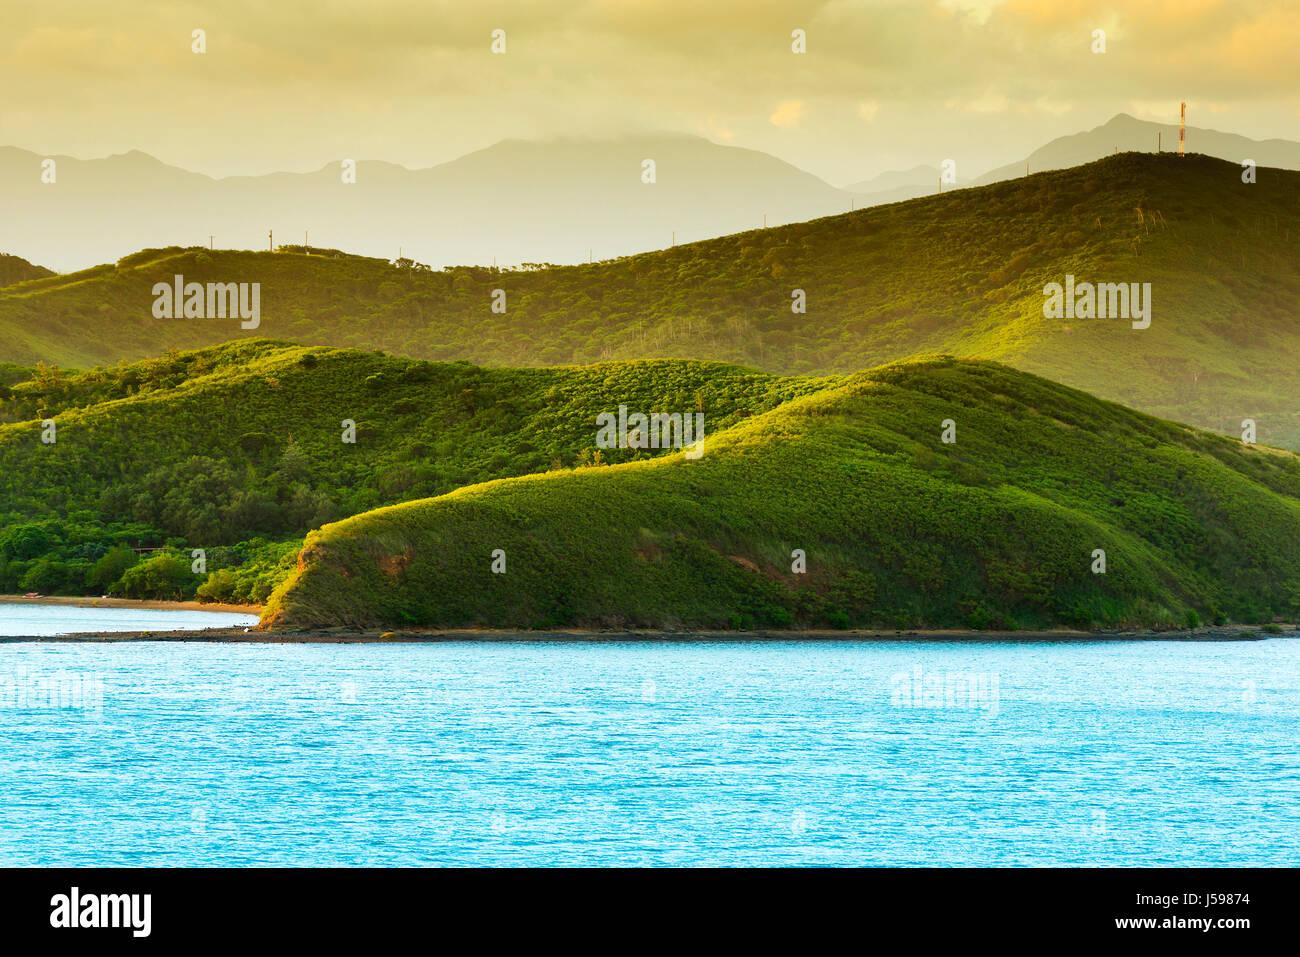 Sunset landscape on the hills around Noumea, New Caledonia - Stock Image